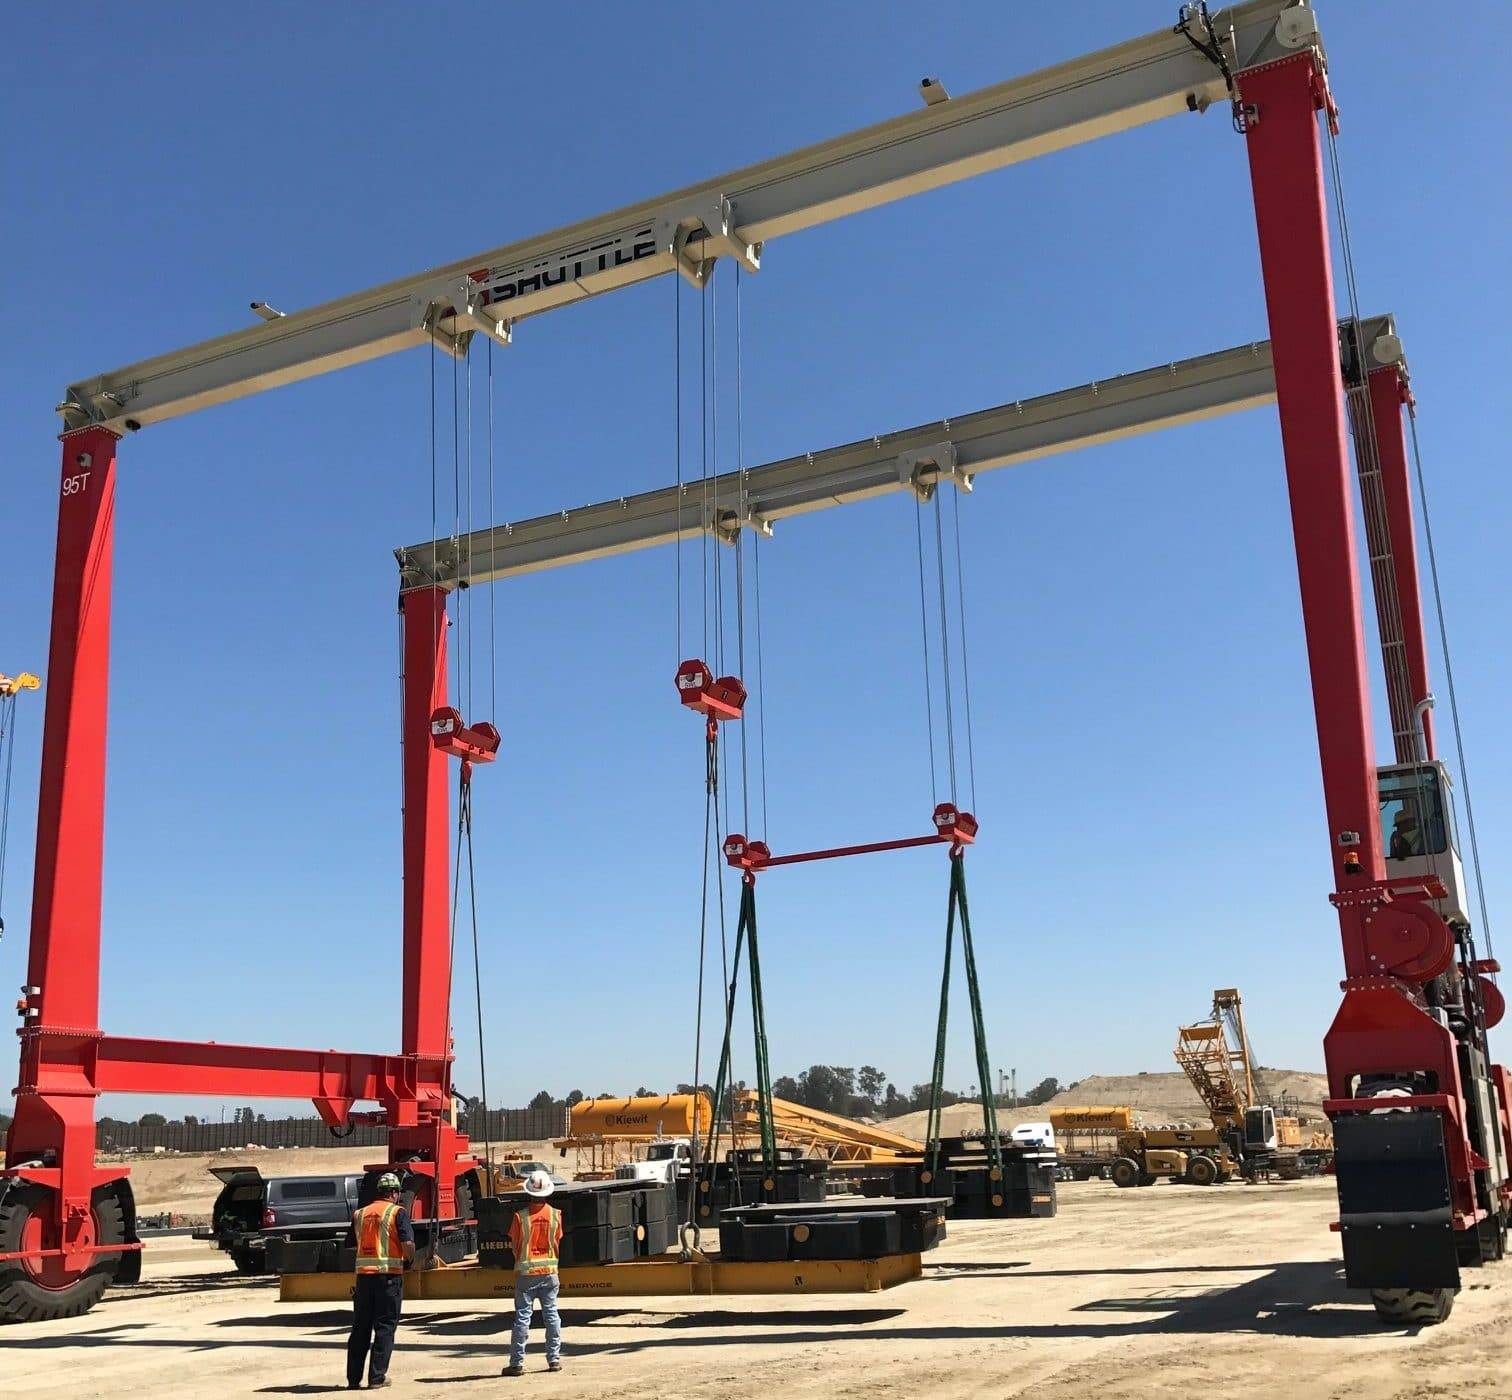 Shuttlelift Crane on Construction Site Lifting